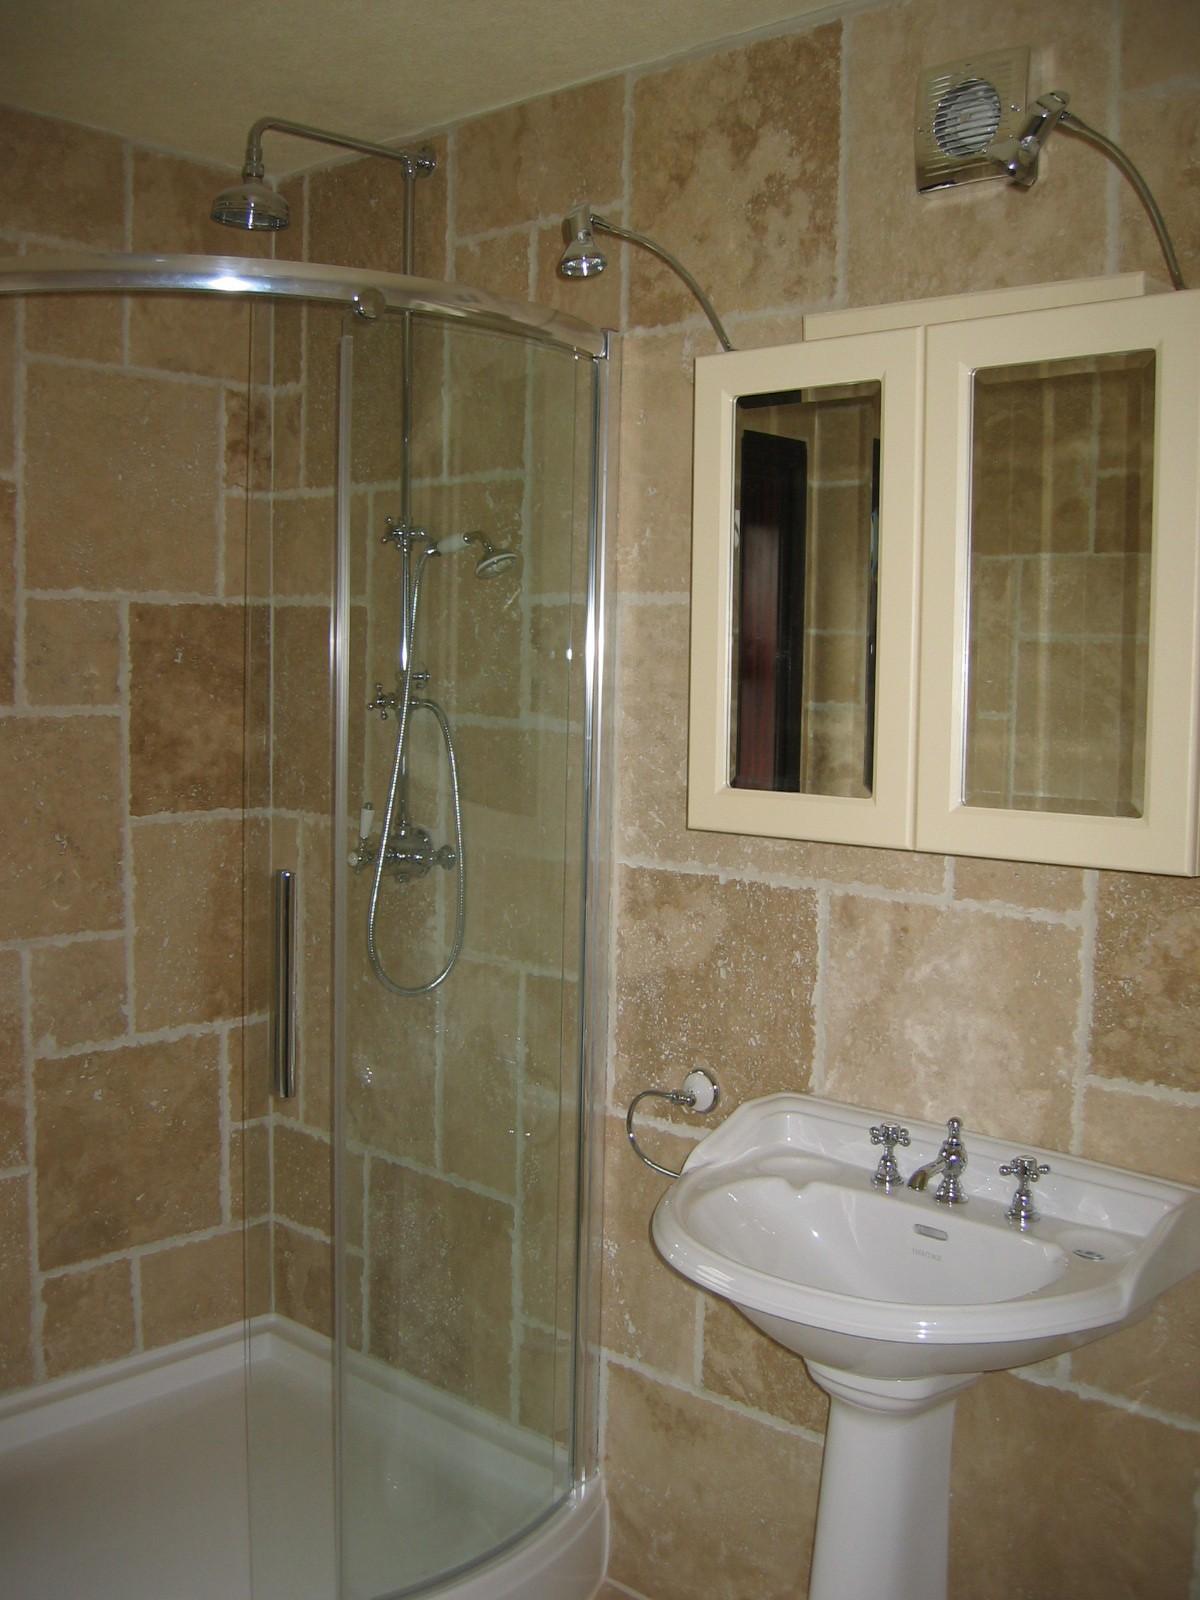 Discount Bathroom Tile Wonderful Interesting Inexpensive Bathroom Tile Ideas Best Cheap Tiles Picture